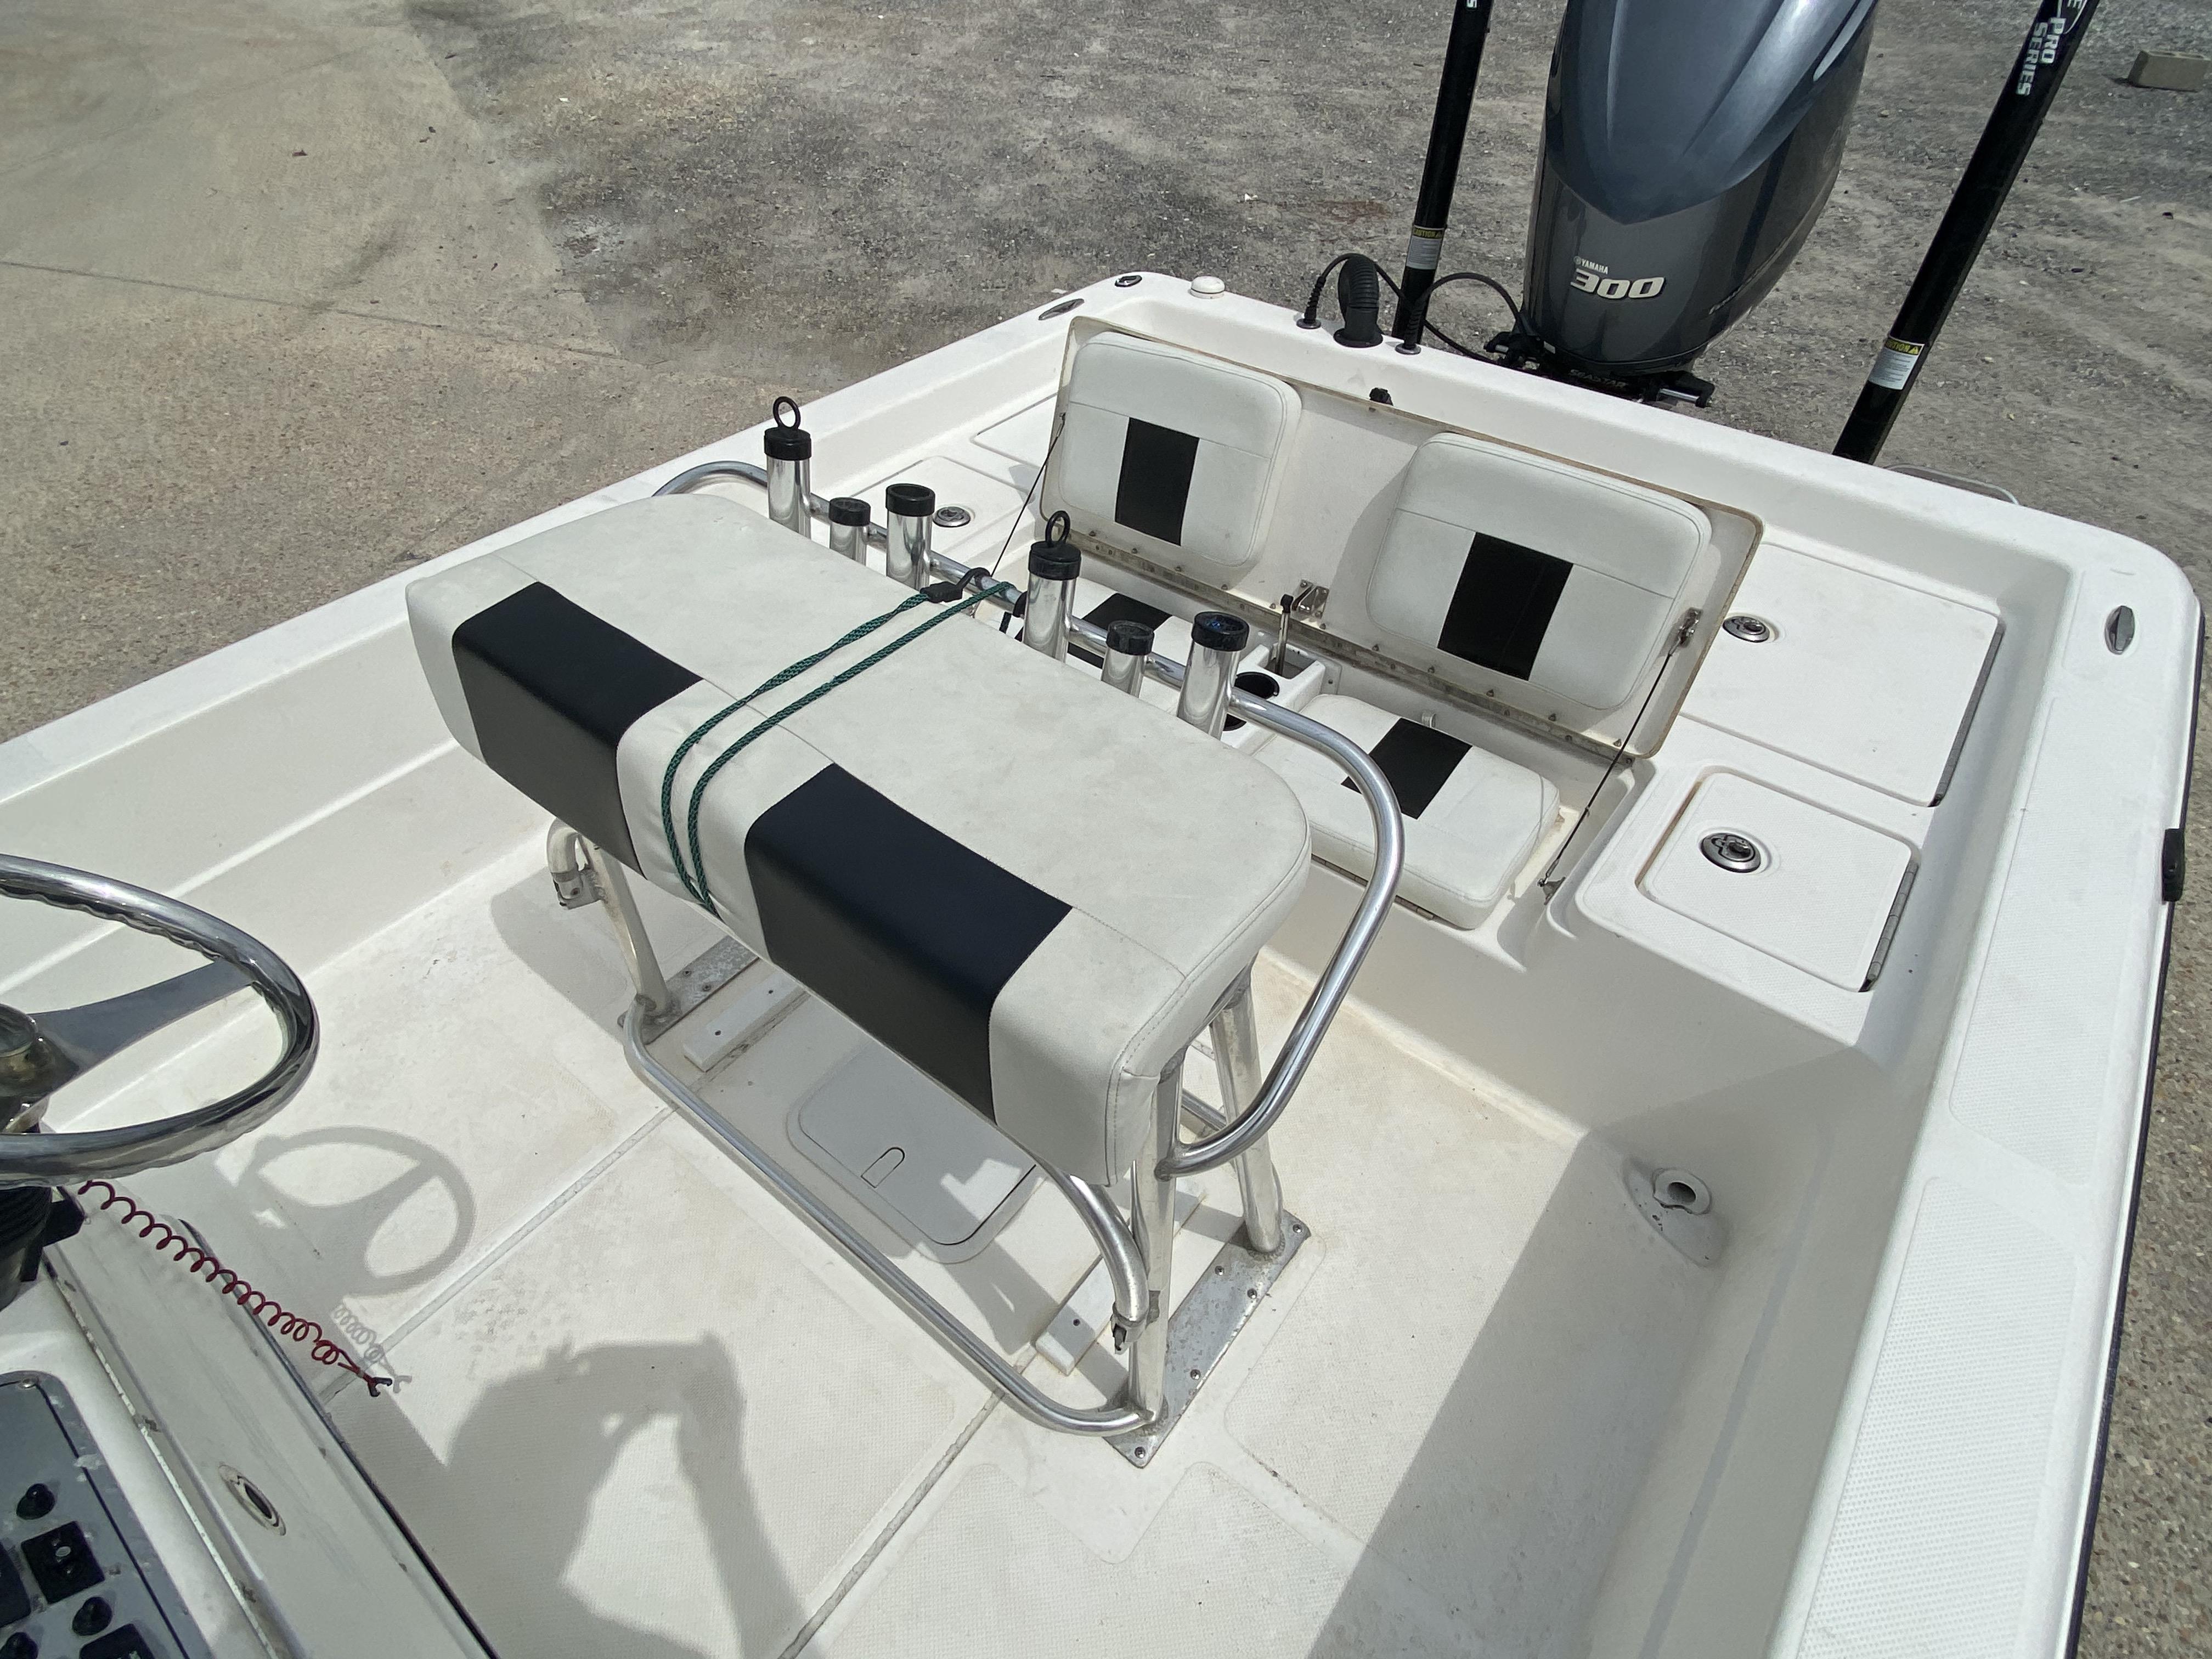 2010 Skeeter boat for sale, model of the boat is ZX 24V & Image # 18 of 18